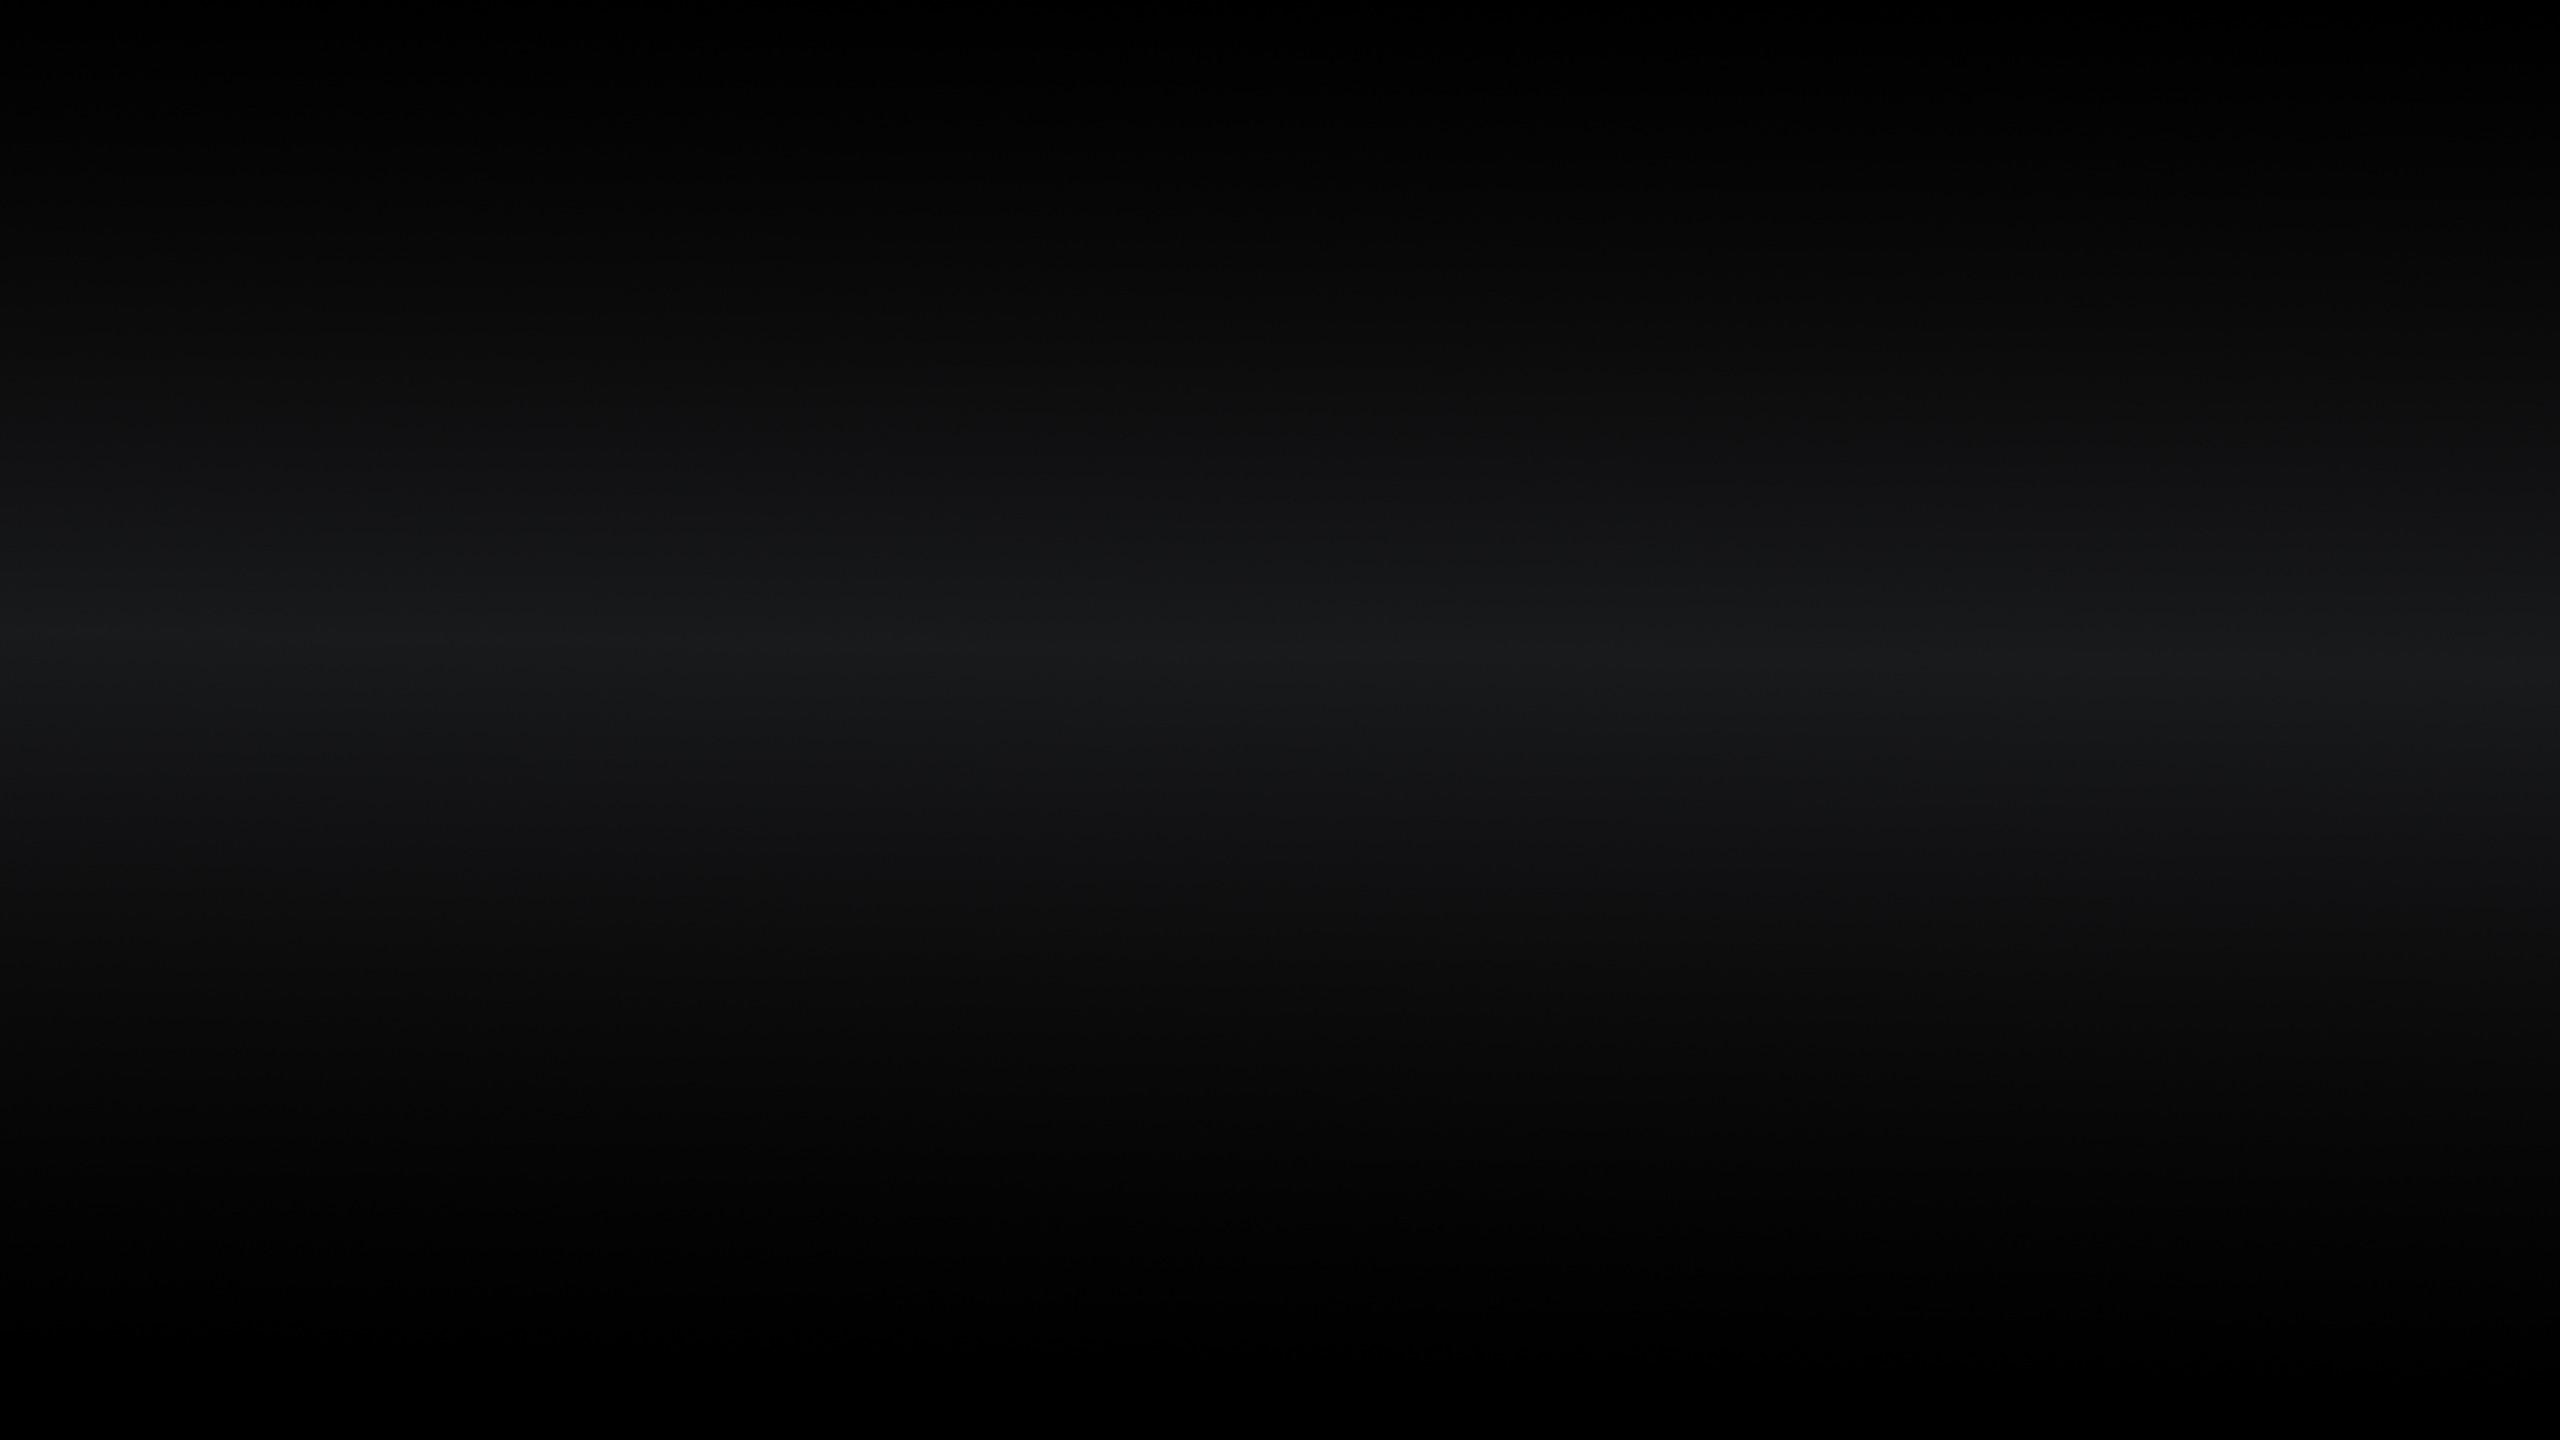 1920x1080 Texture Pattern Black A